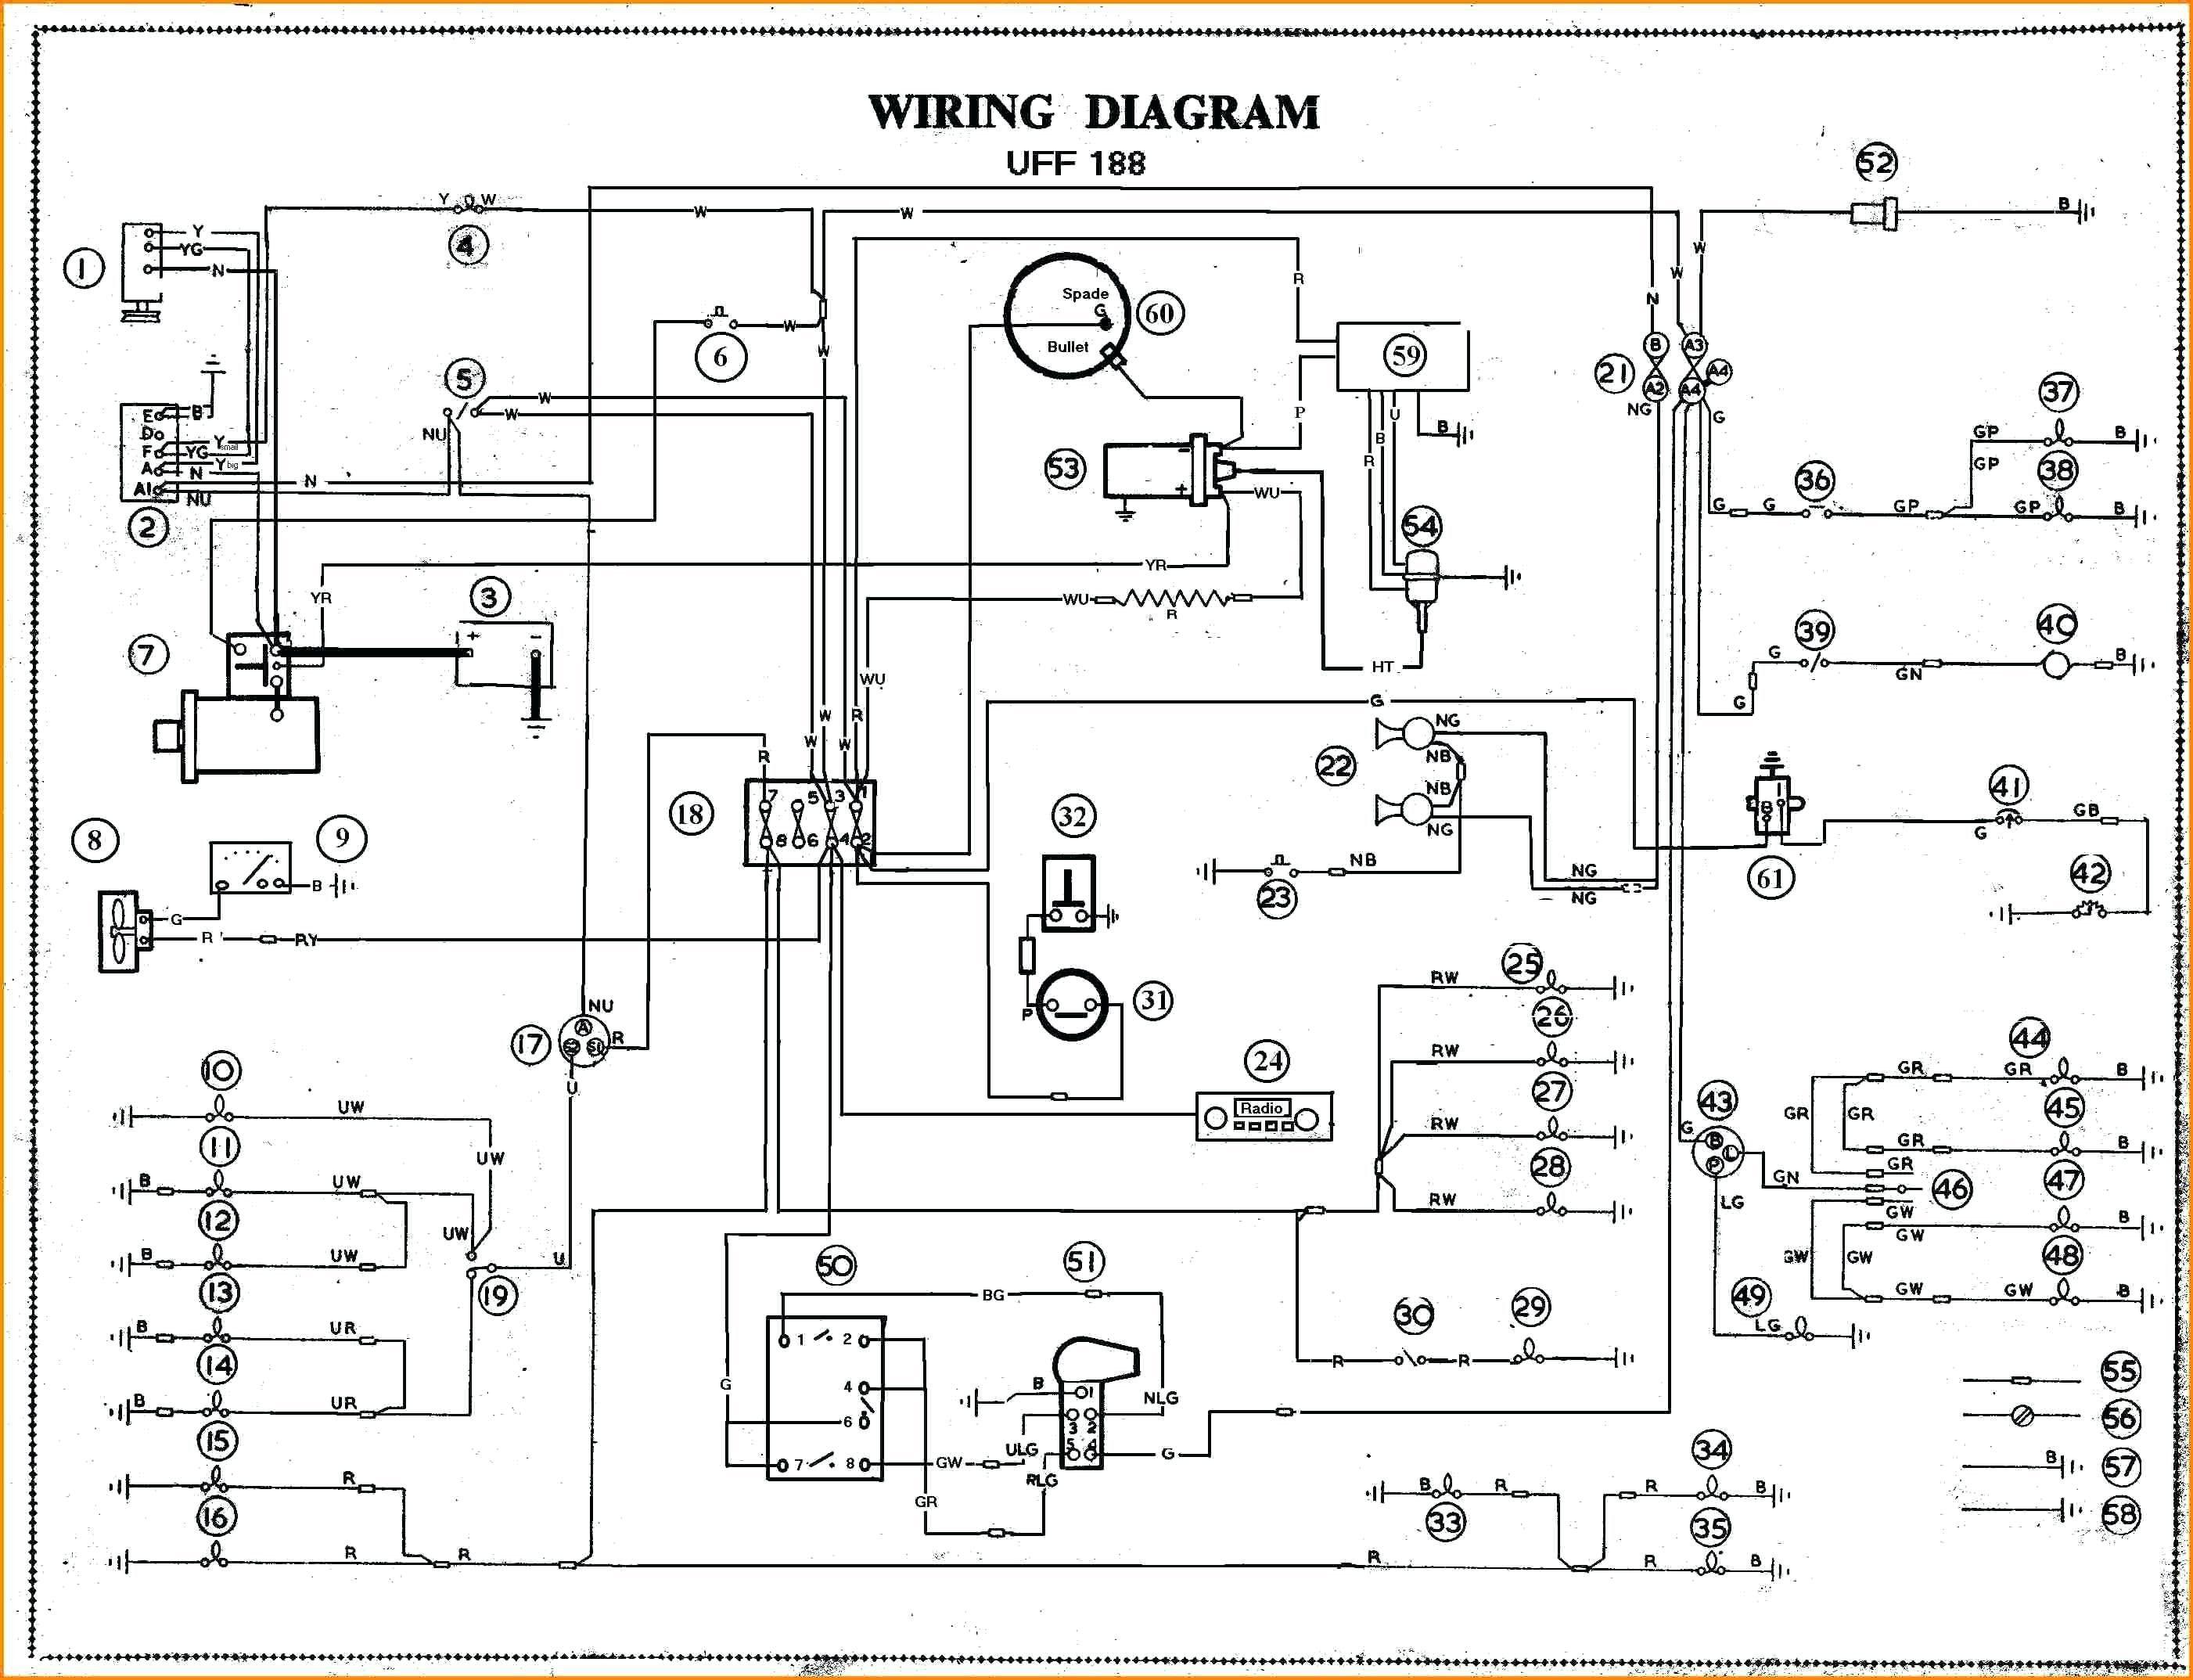 images?q=tbn:ANd9GcQh_l3eQ5xwiPy07kGEXjmjgmBKBRB7H2mRxCGhv1tFWg5c_mWT Wiring Diagram